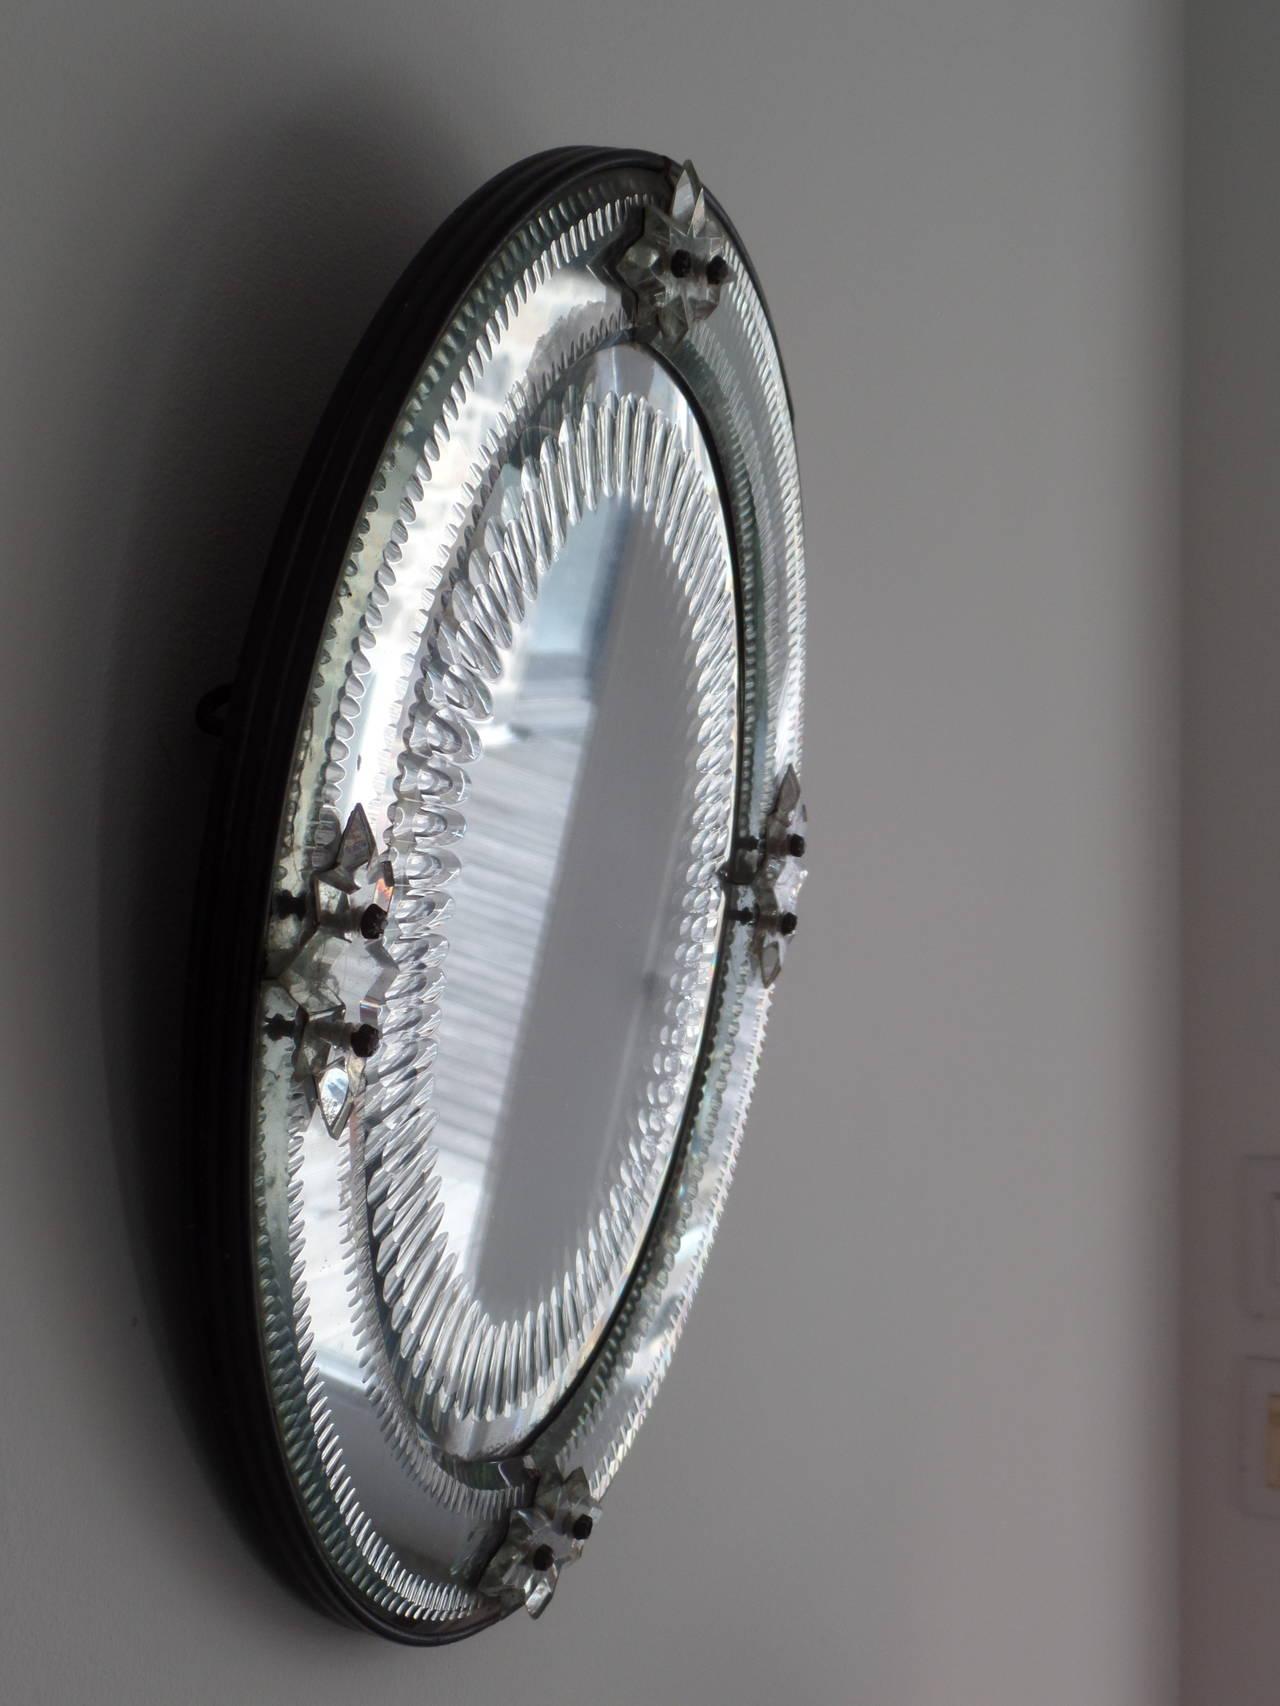 Italian, 1930s Engraved Sunburst Venetian Mirror 4